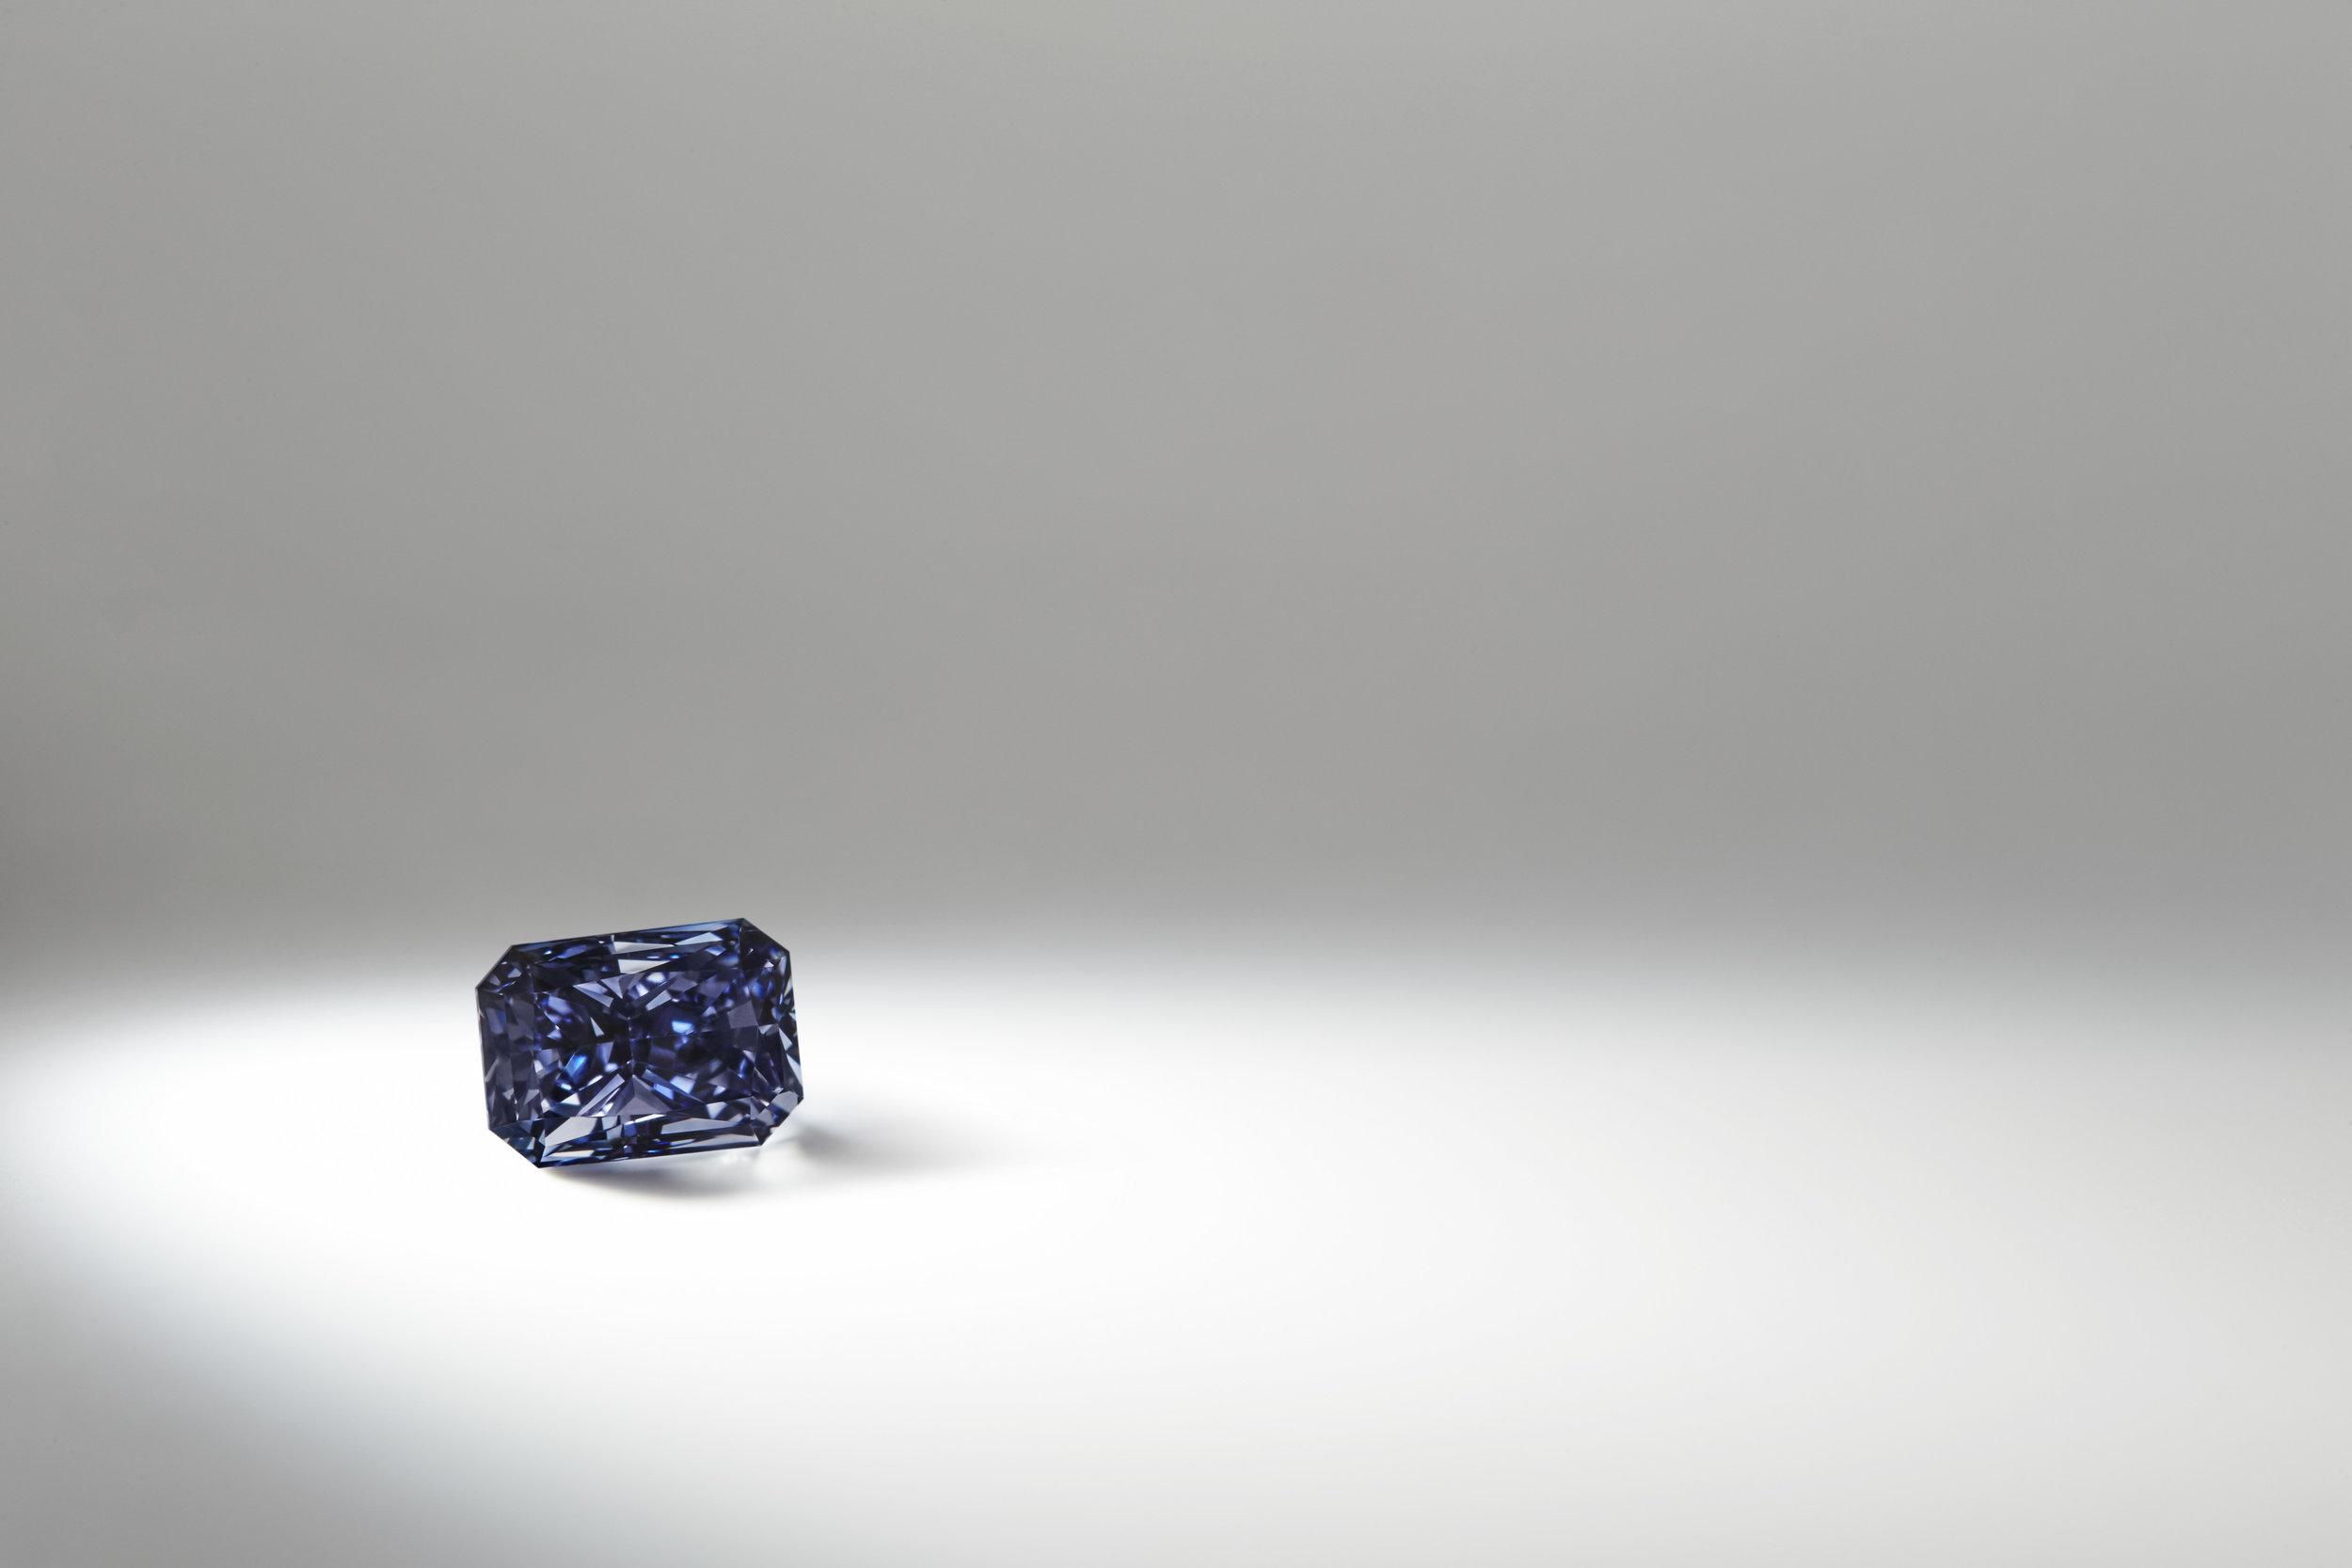 Argyle Liberté - The 0.91 carat radiant known as the Argyle Liberté™ is a remarkable gem from the Argyle mine in Western Australia, part of the 2017 Argyle Pink Diamond Tender.